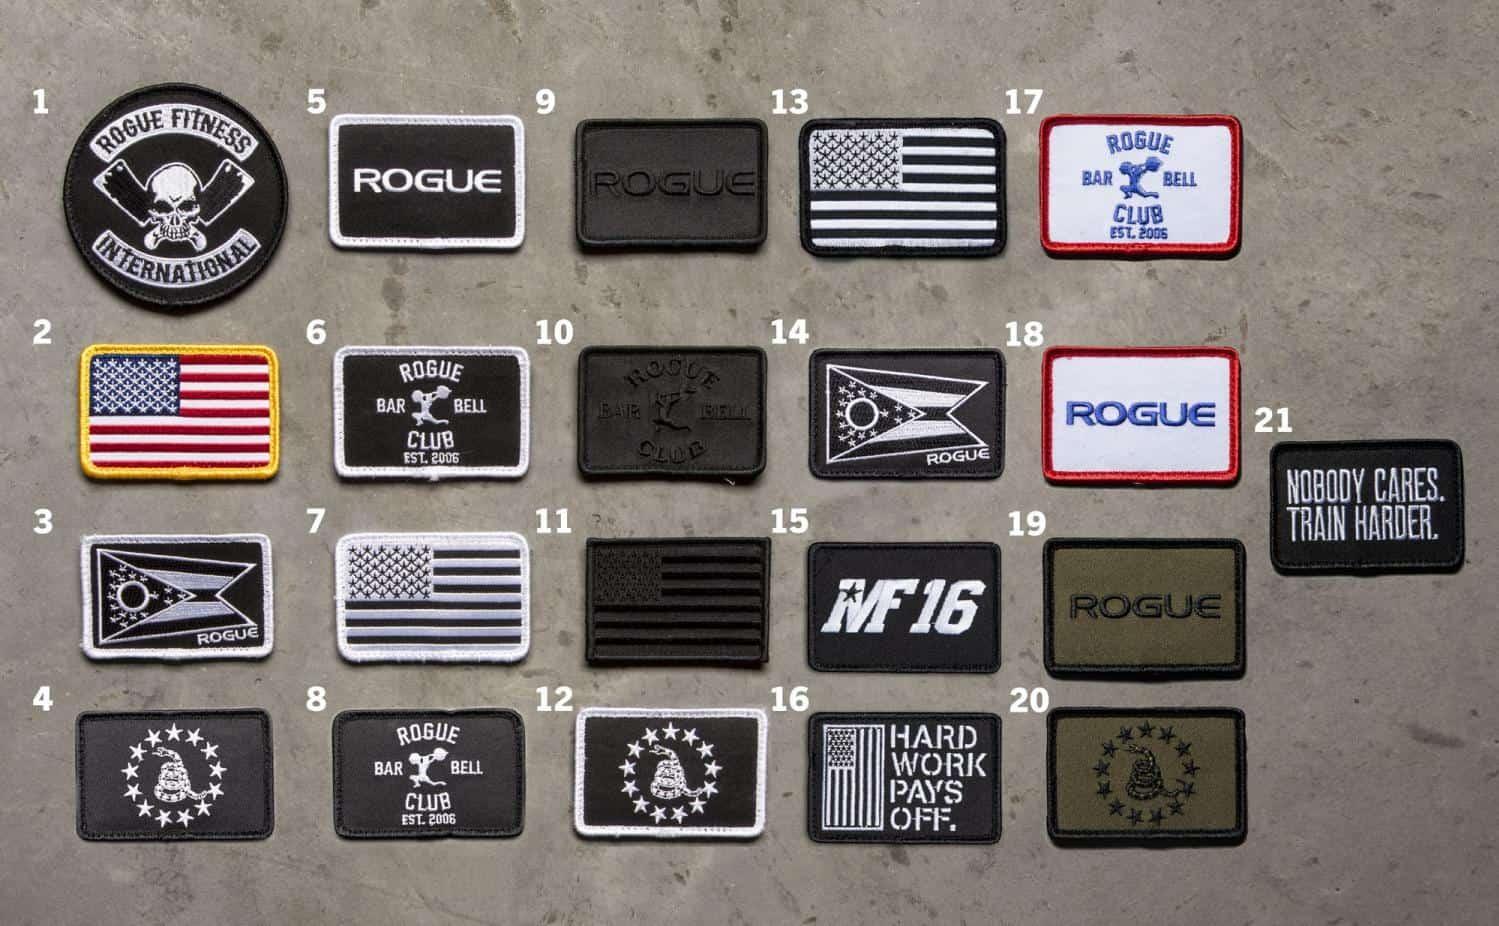 Rogue USA Nylon Lifting Belt patches